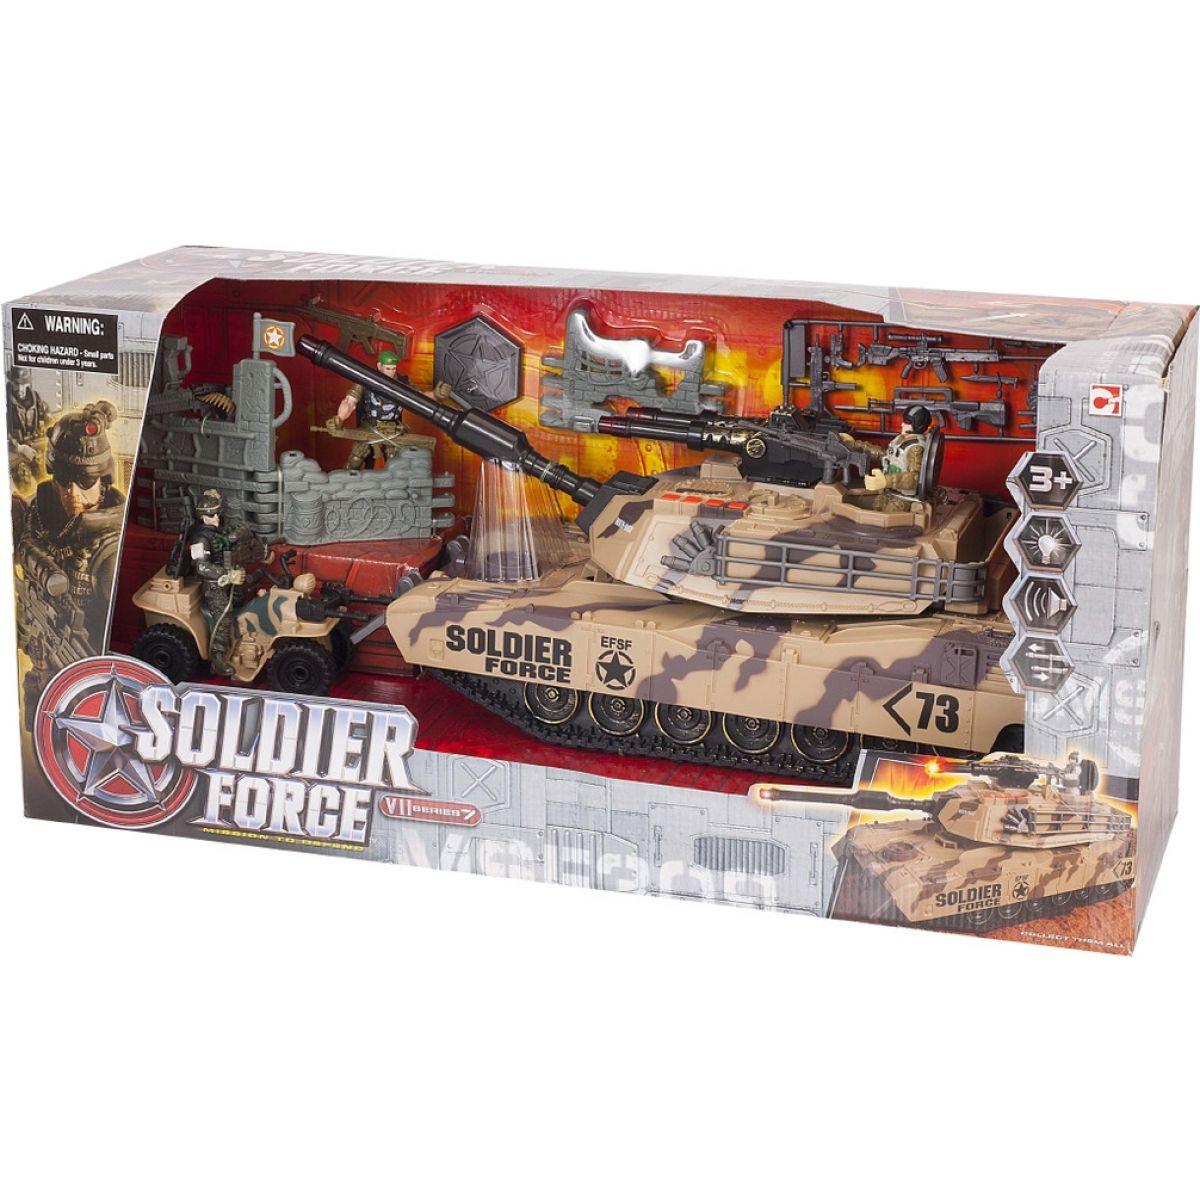 Vojenská sada s tankem a doplňky